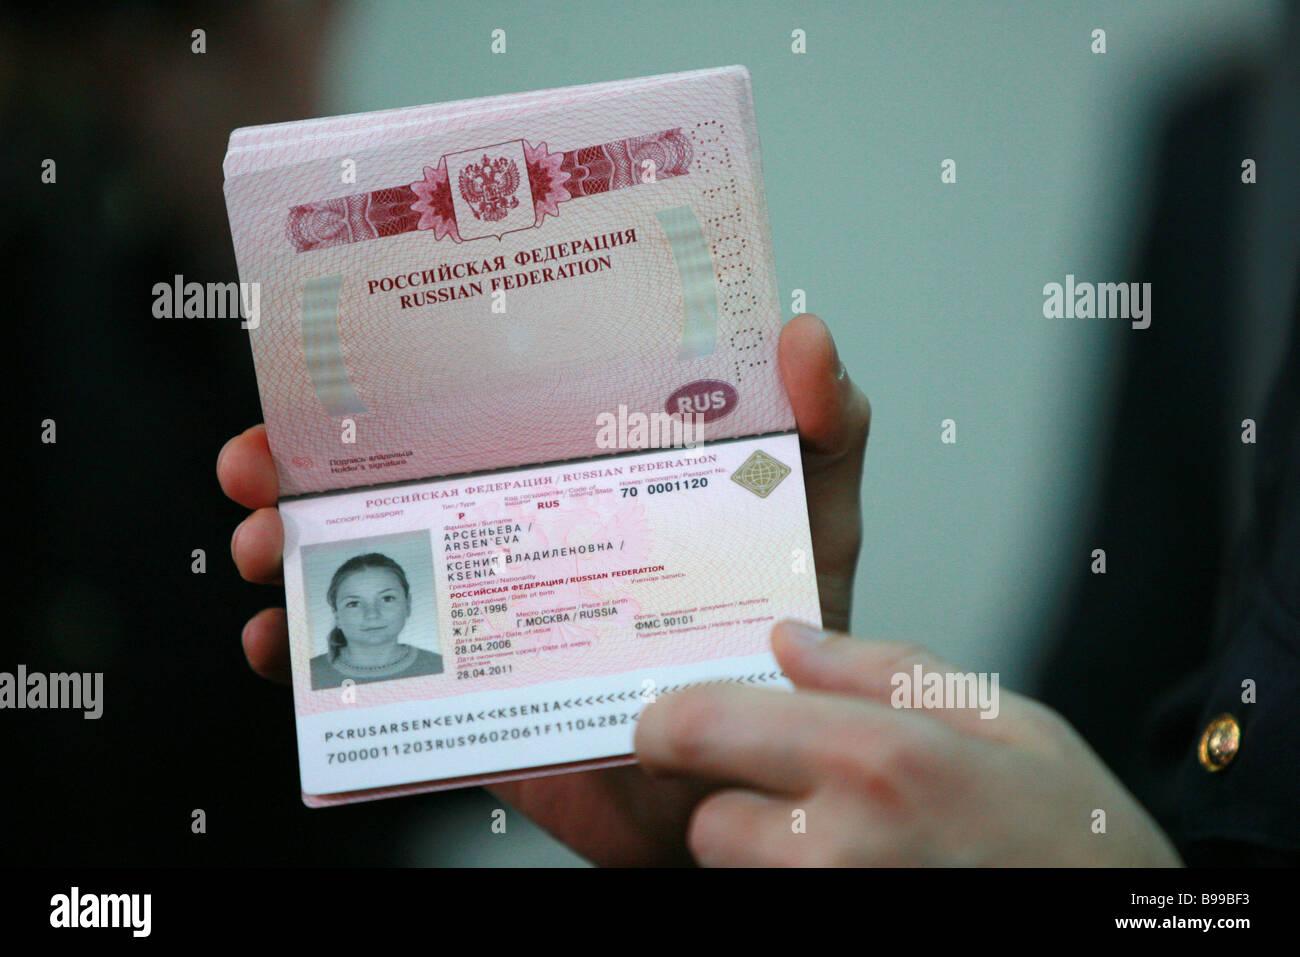 A new generation passport with biometric data - Stock Image